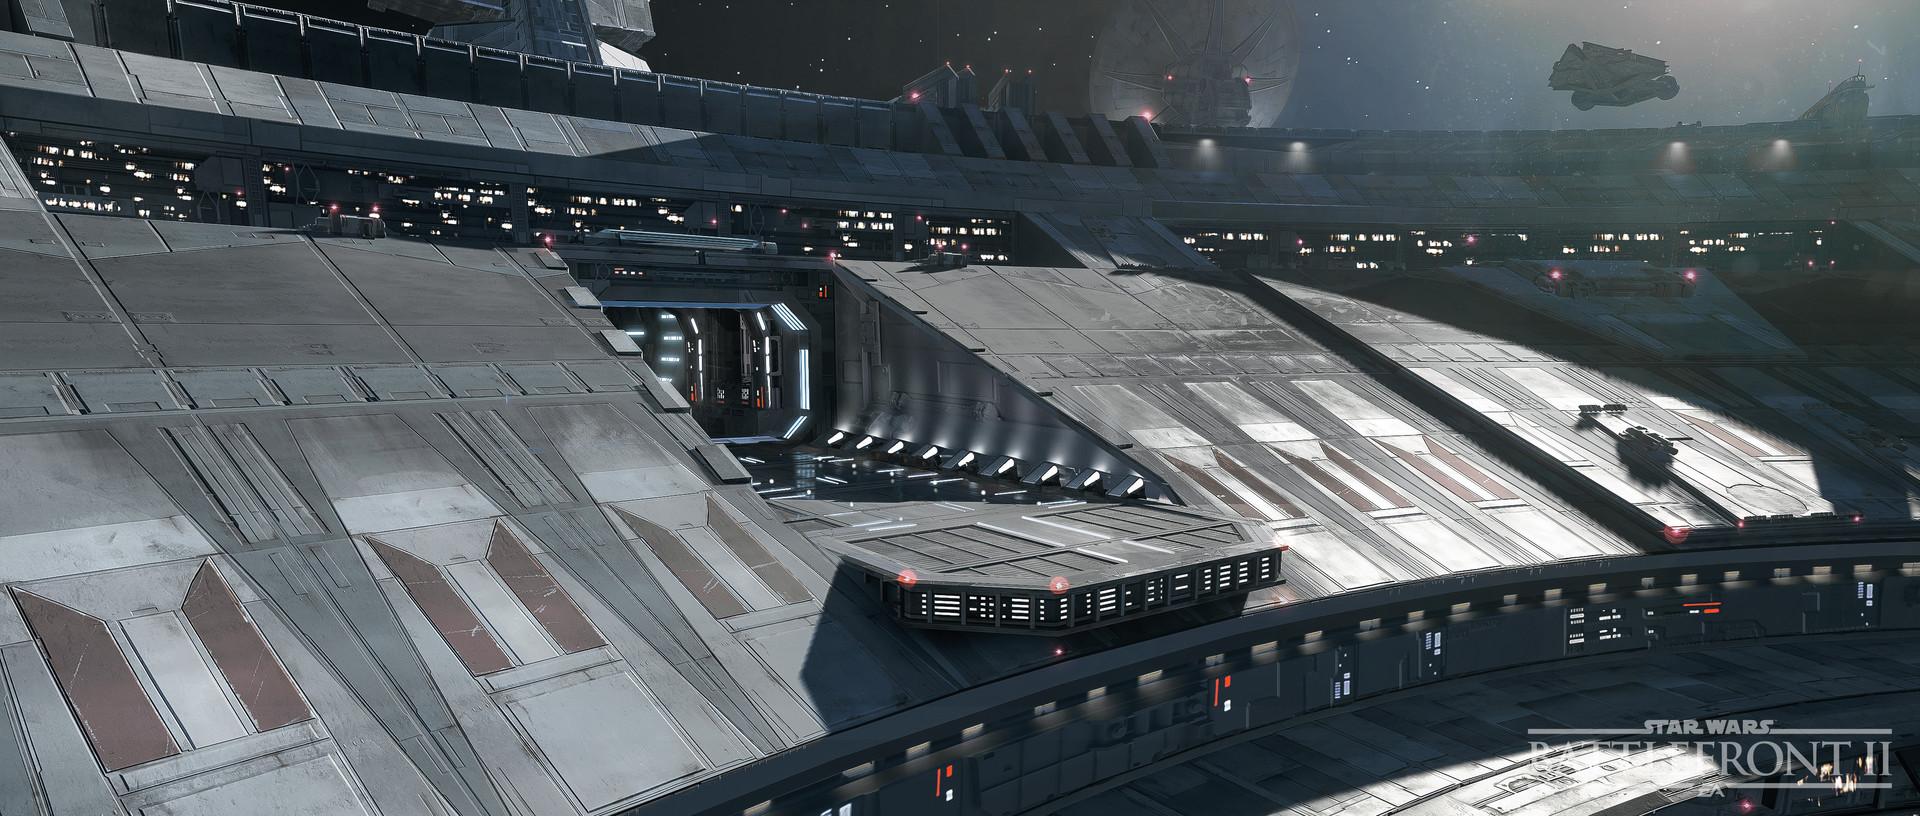 Darius kalinauskas fondor dock starwars conceptart battlefront 1